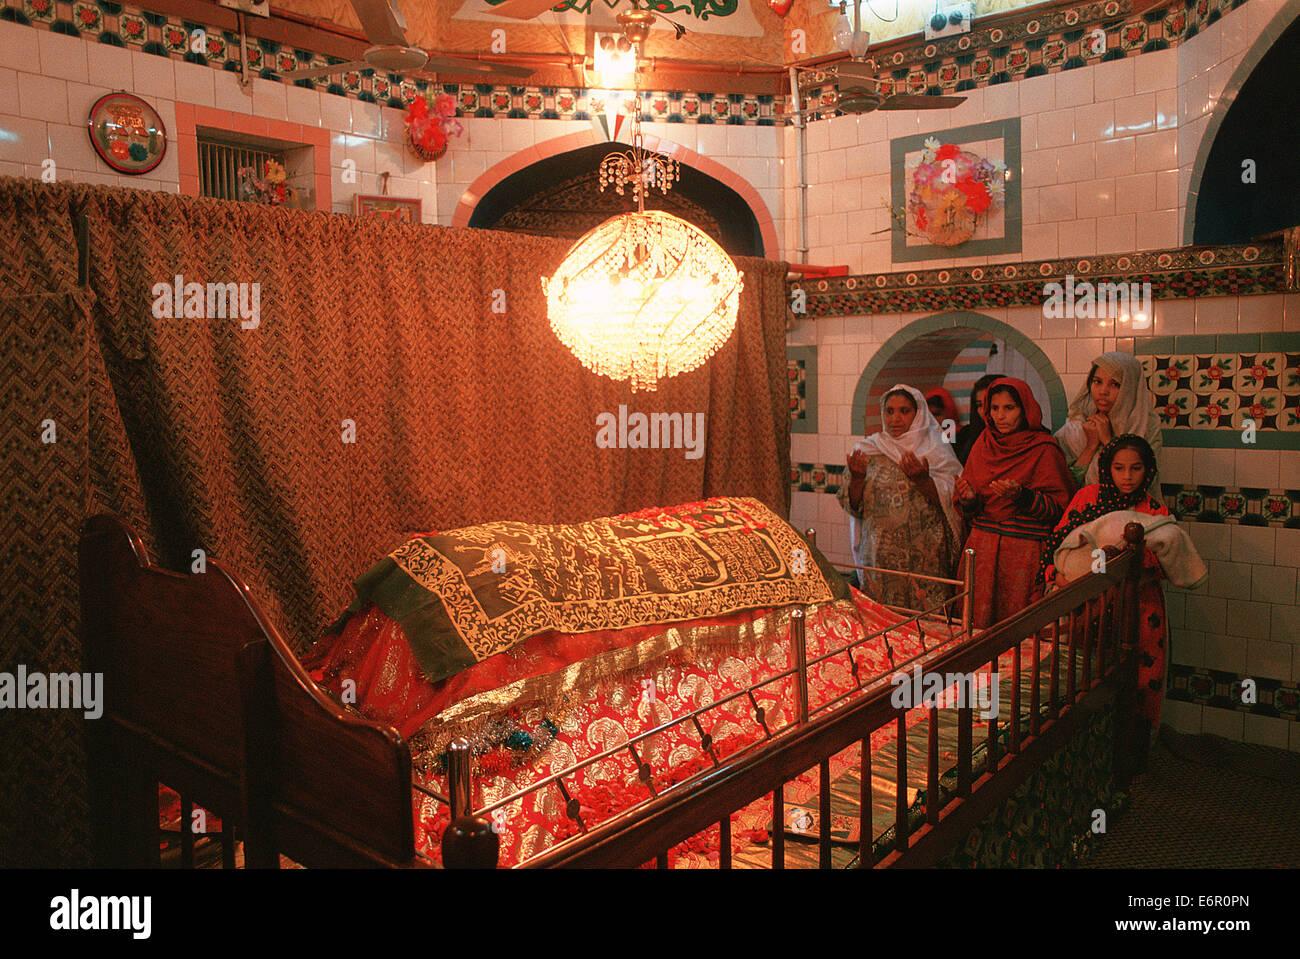 Muslim women praying on the tomb of a respected muslim man ( Pakistan) - Stock Image